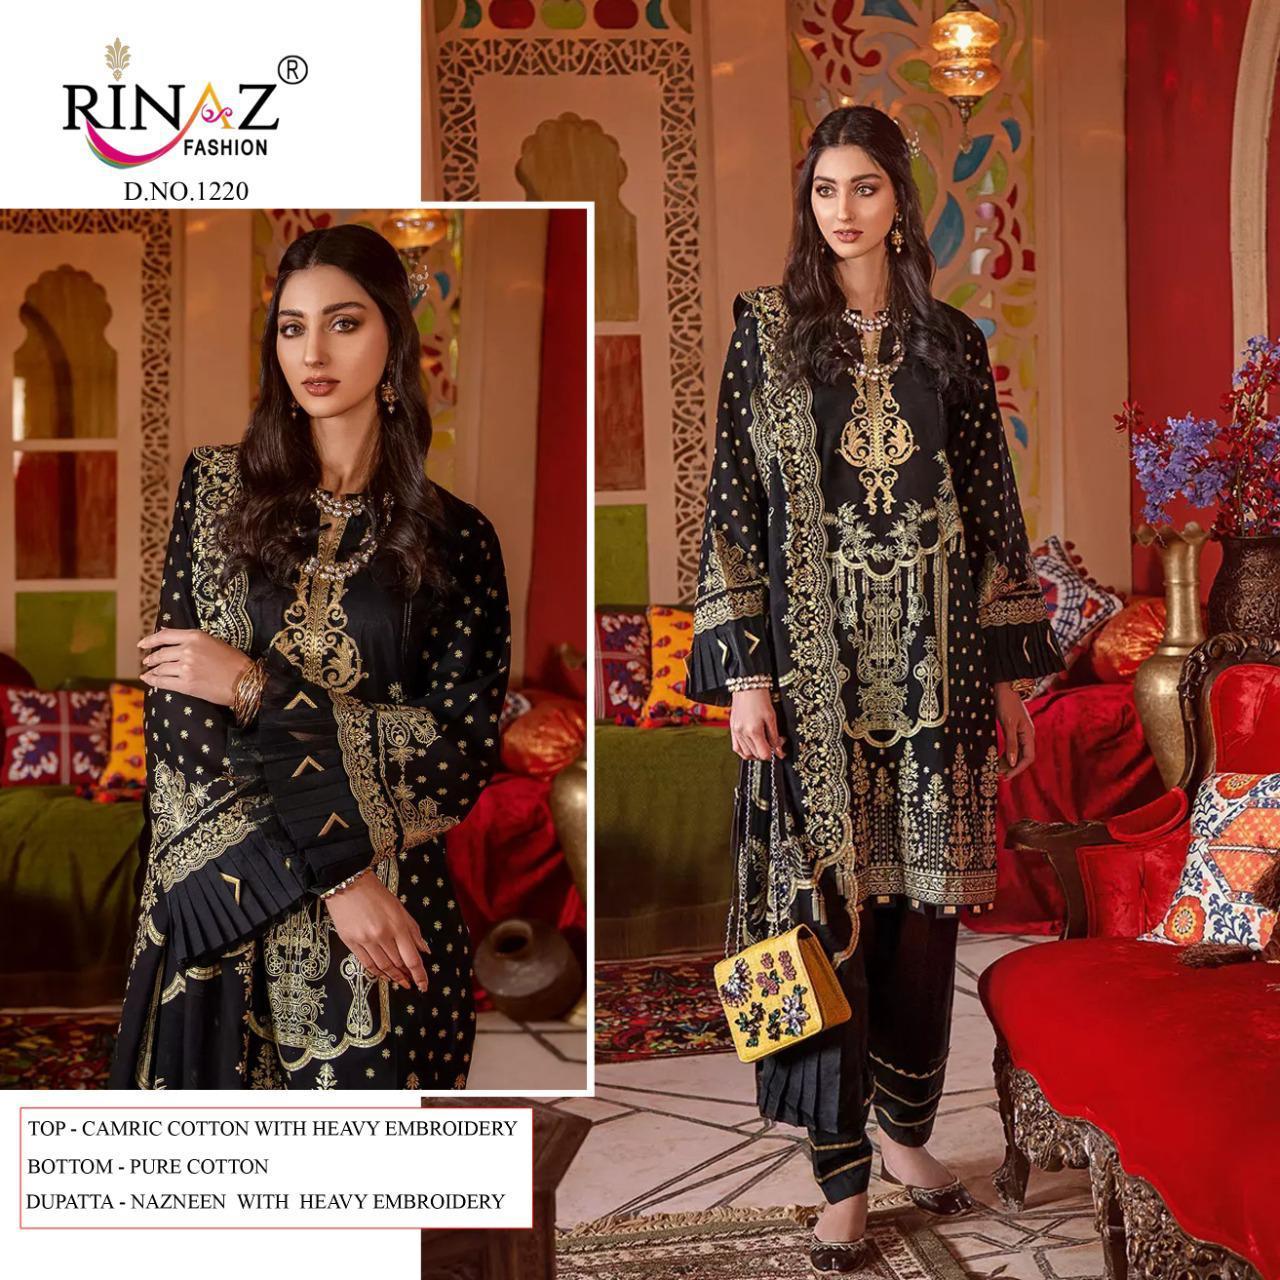 RINAZ FASHION 1220